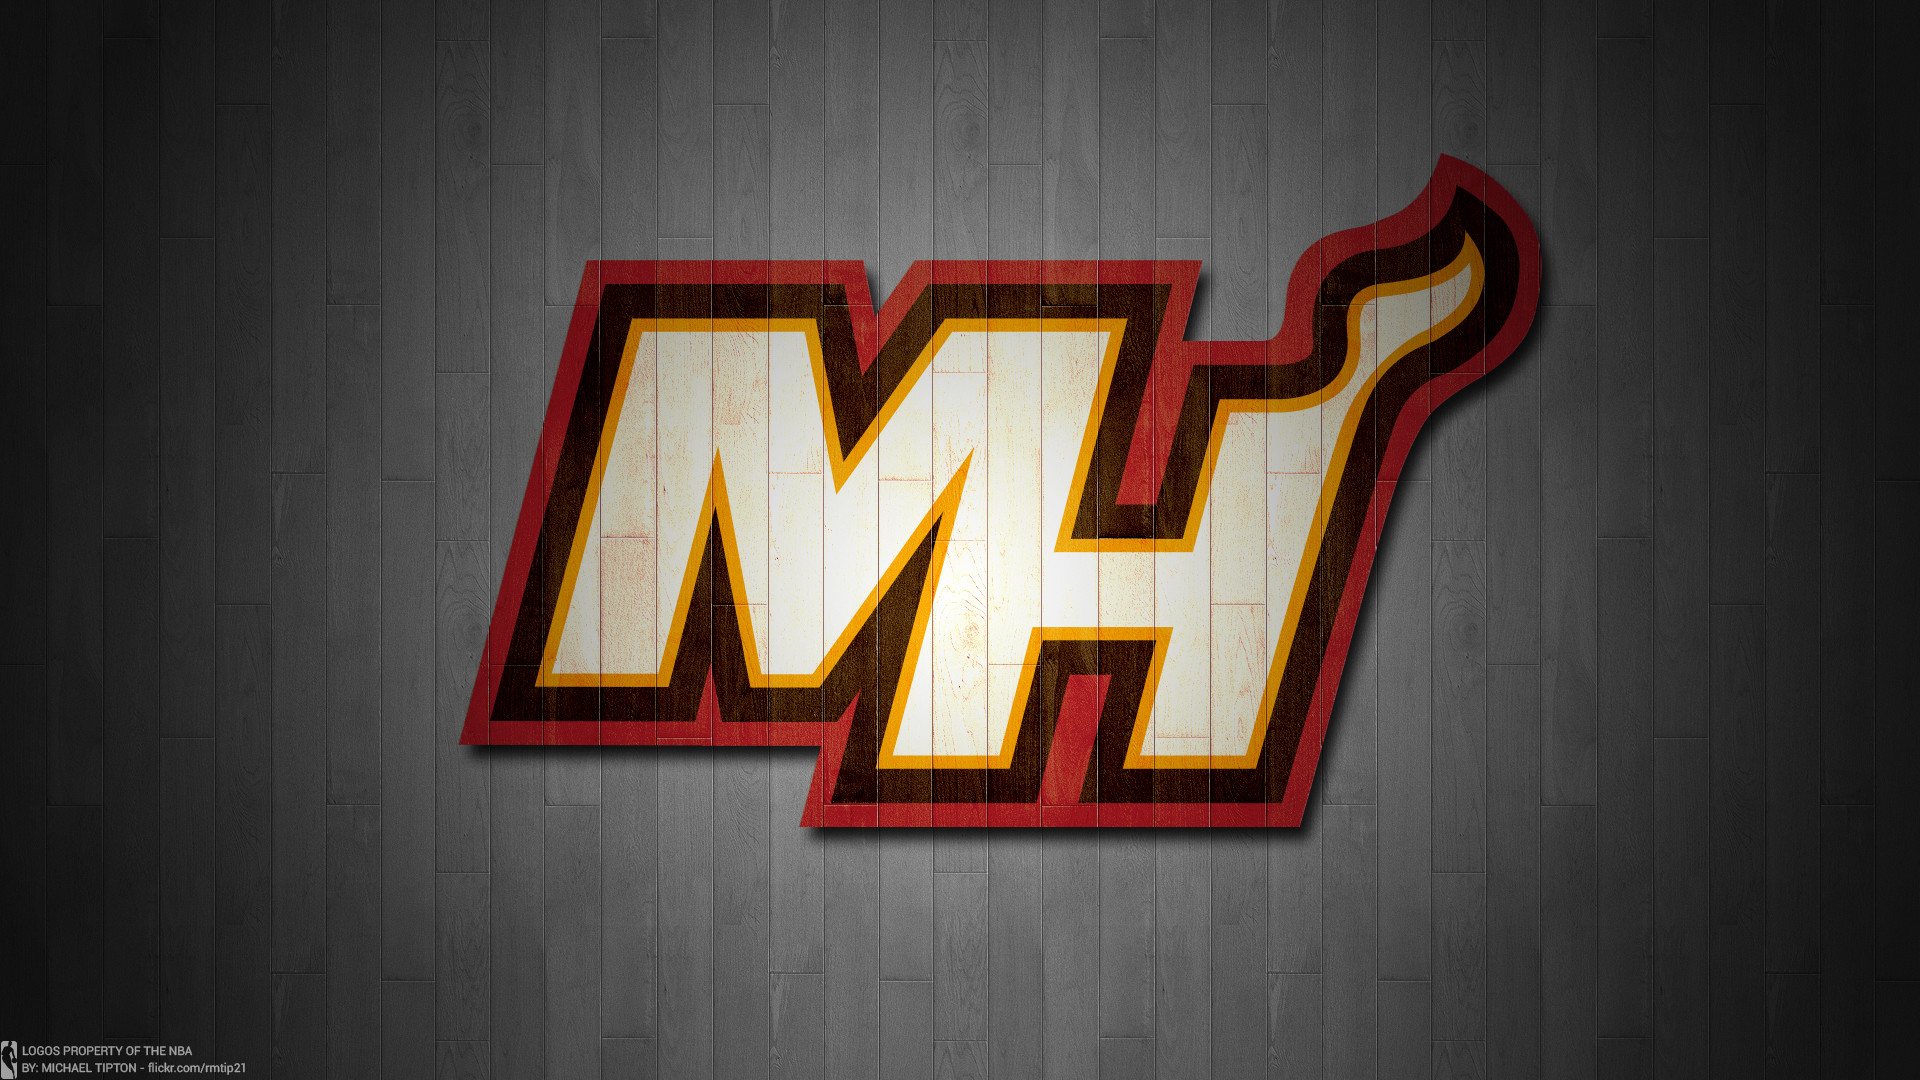 … NBA 2017 Miami Heat hardwood logo desktop wallpaper …